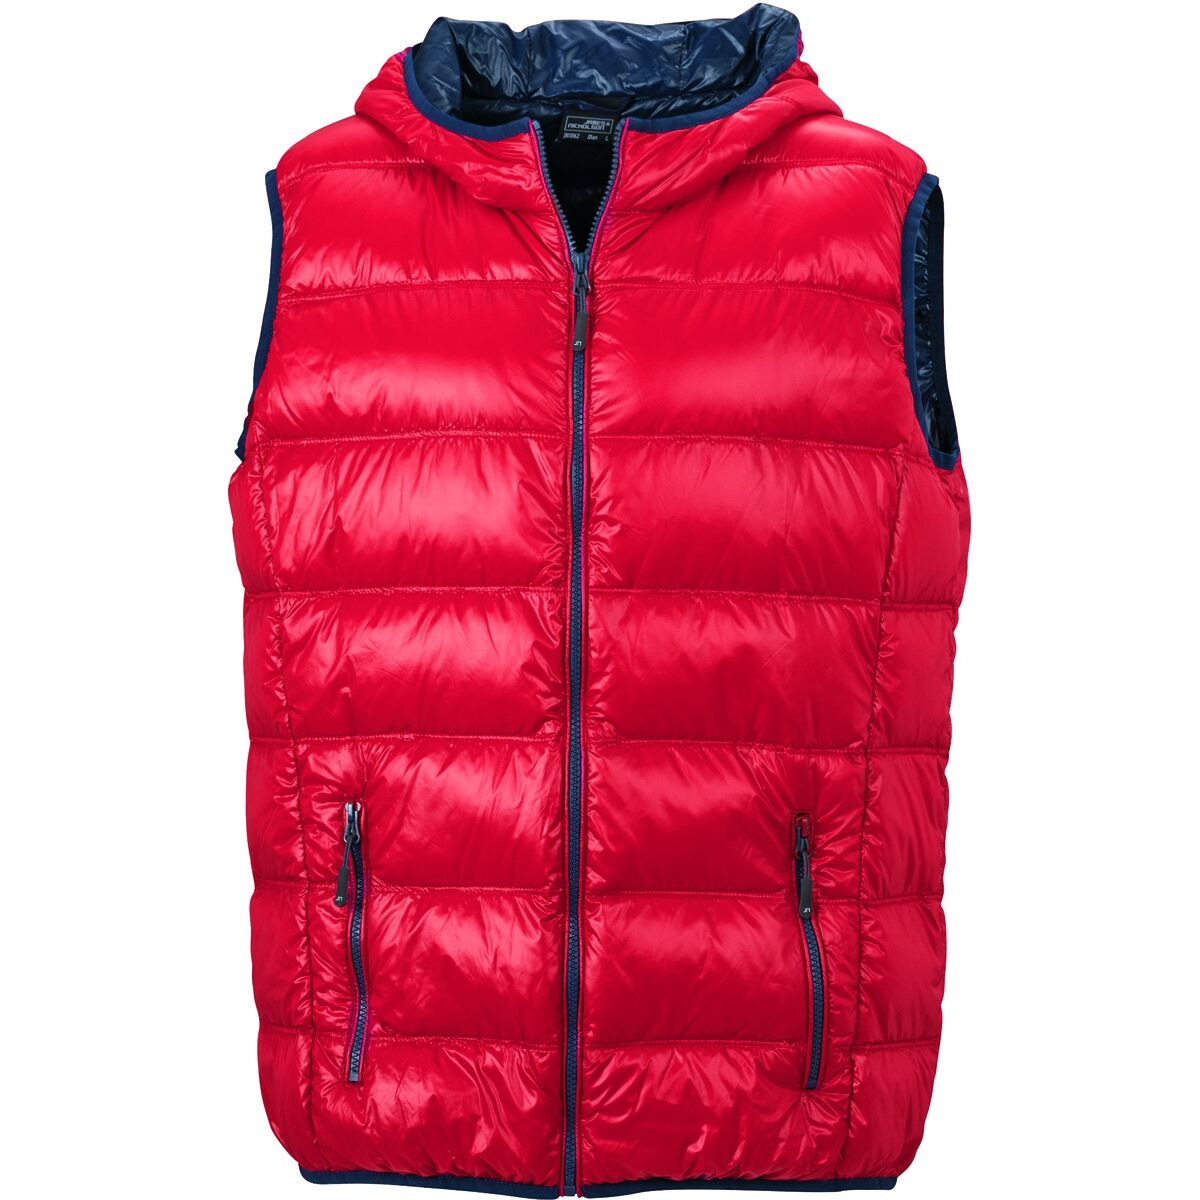 Bodywarmer duvet doudoune sans manches anorak homme - JN1062 - rouge